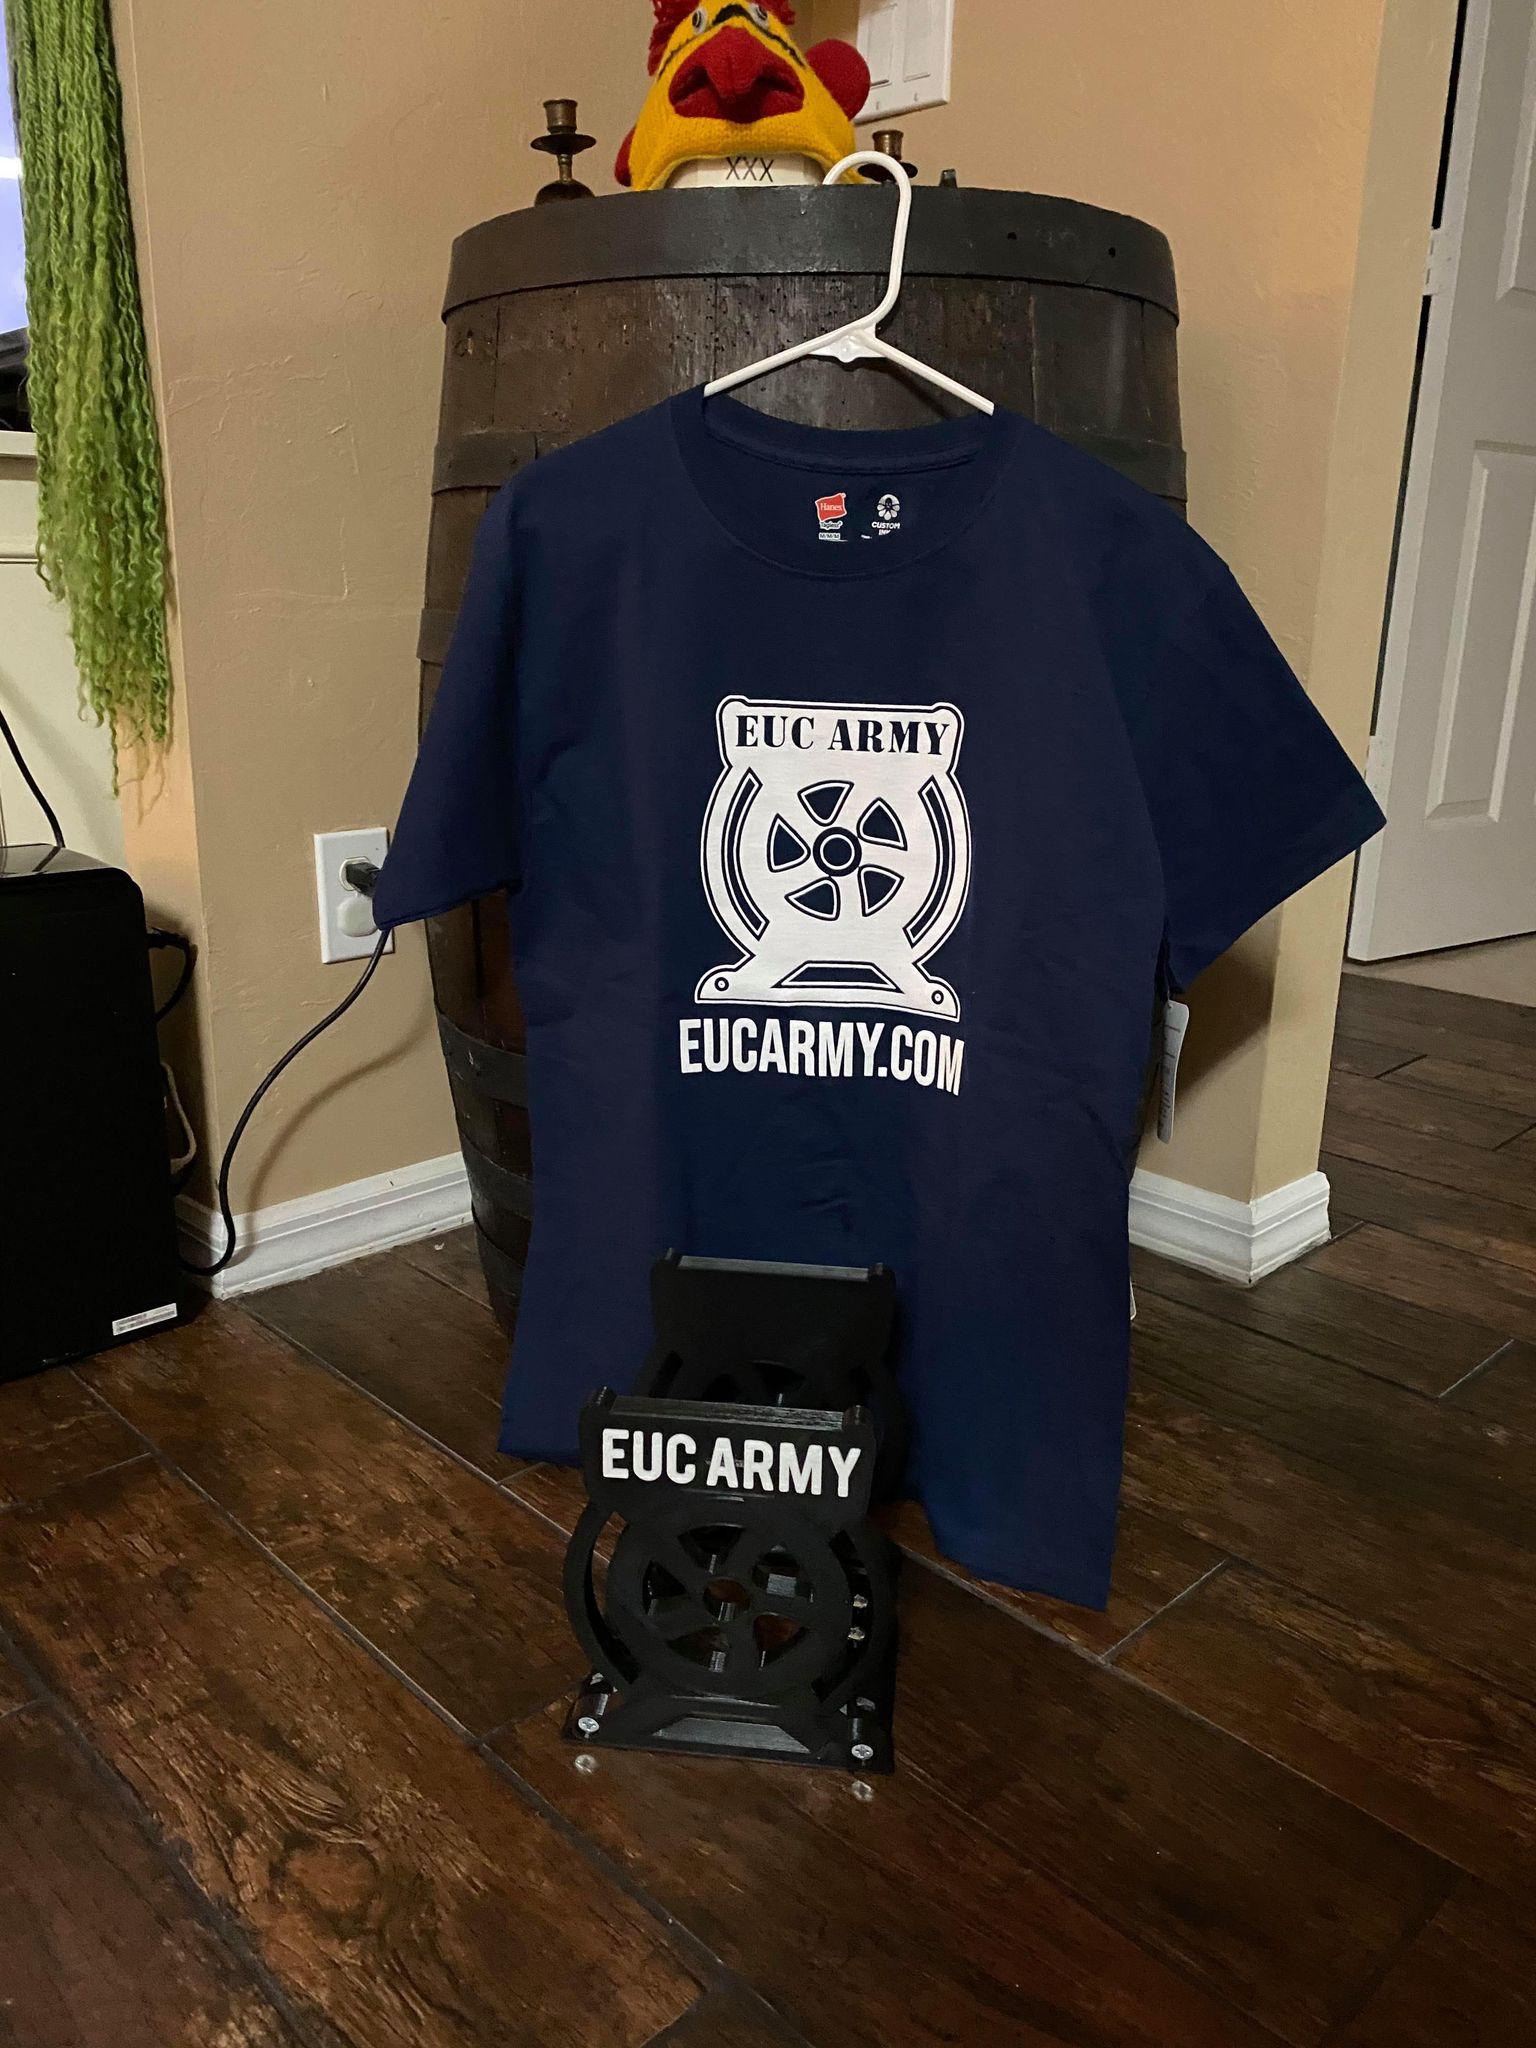 EUC Army T-shirt